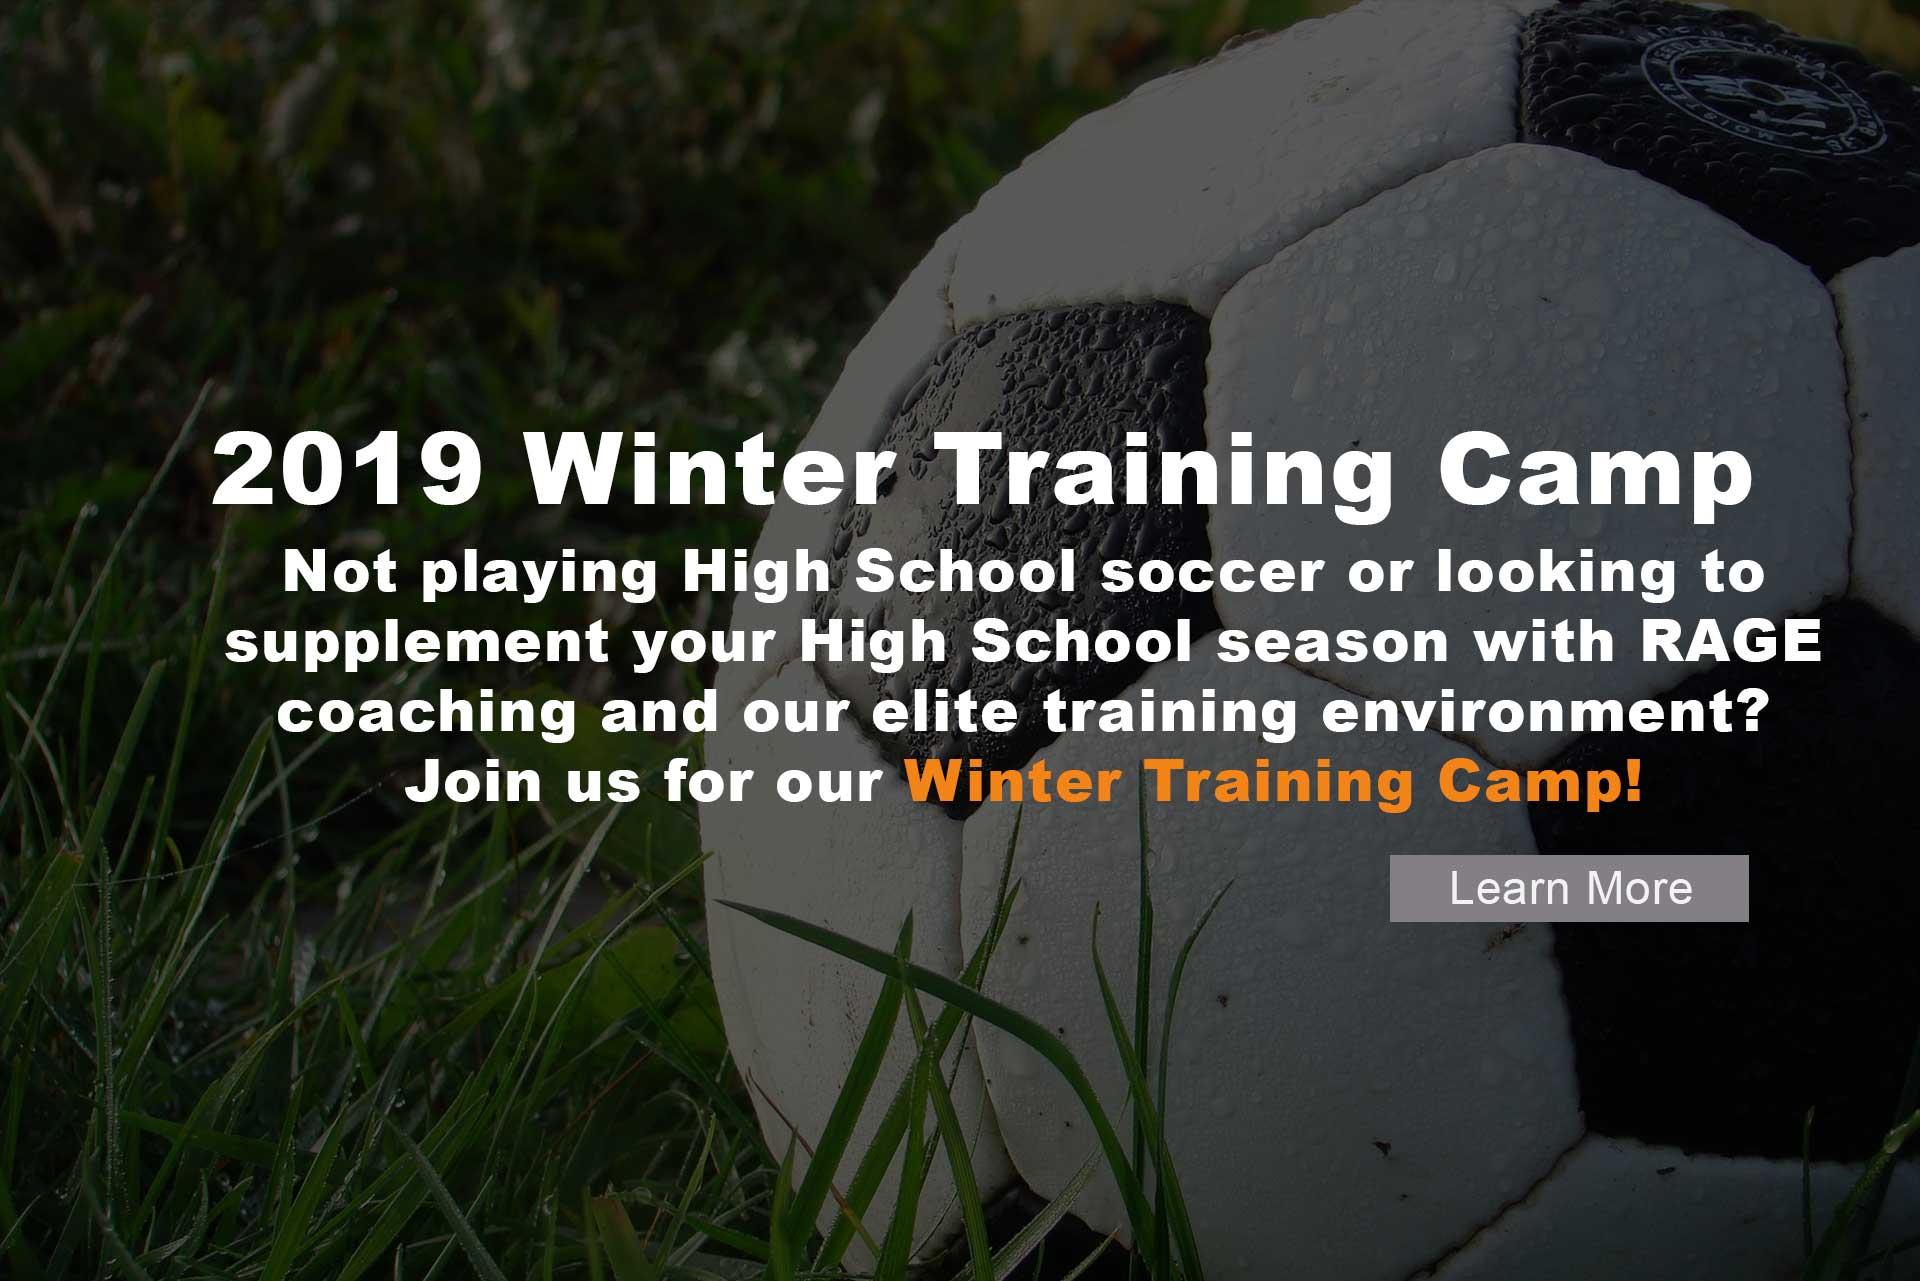 RAGE Winter Training Camp